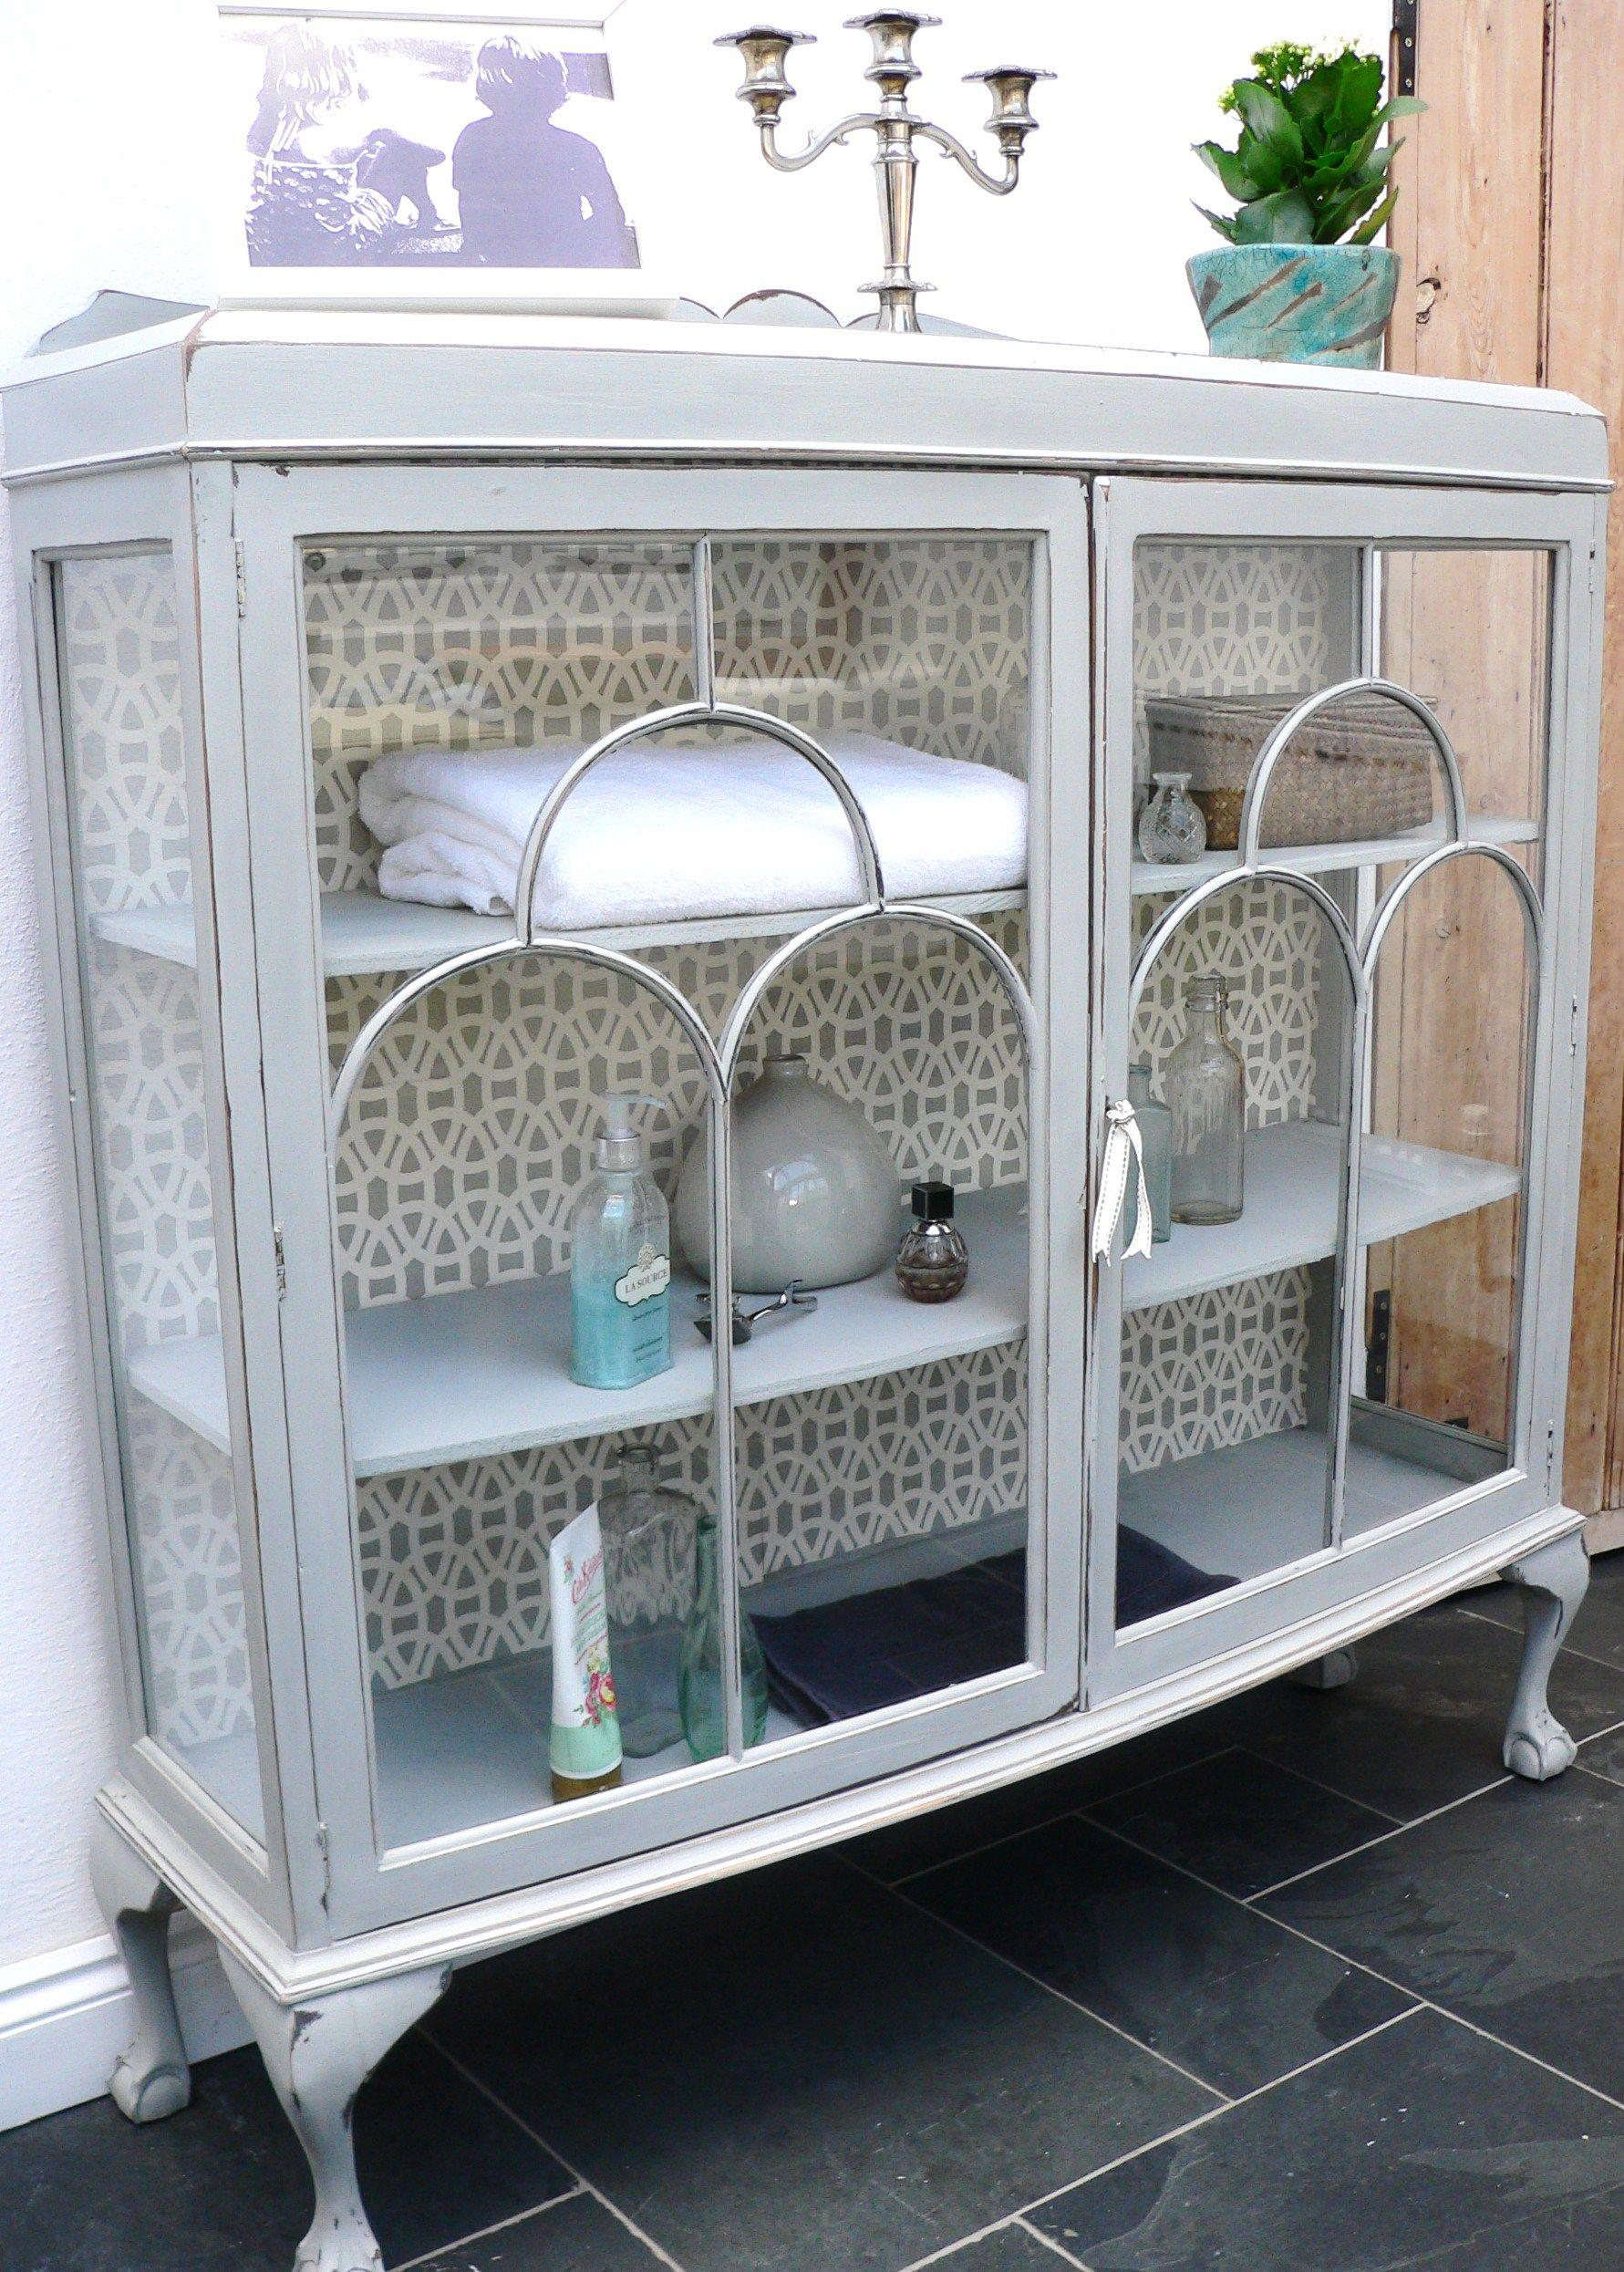 Vintage bathroom storage cabinets - Vintage Painted Furniture Wales Vale Of Glamorgan Victorian Cabinet Vintage Painted Furniture